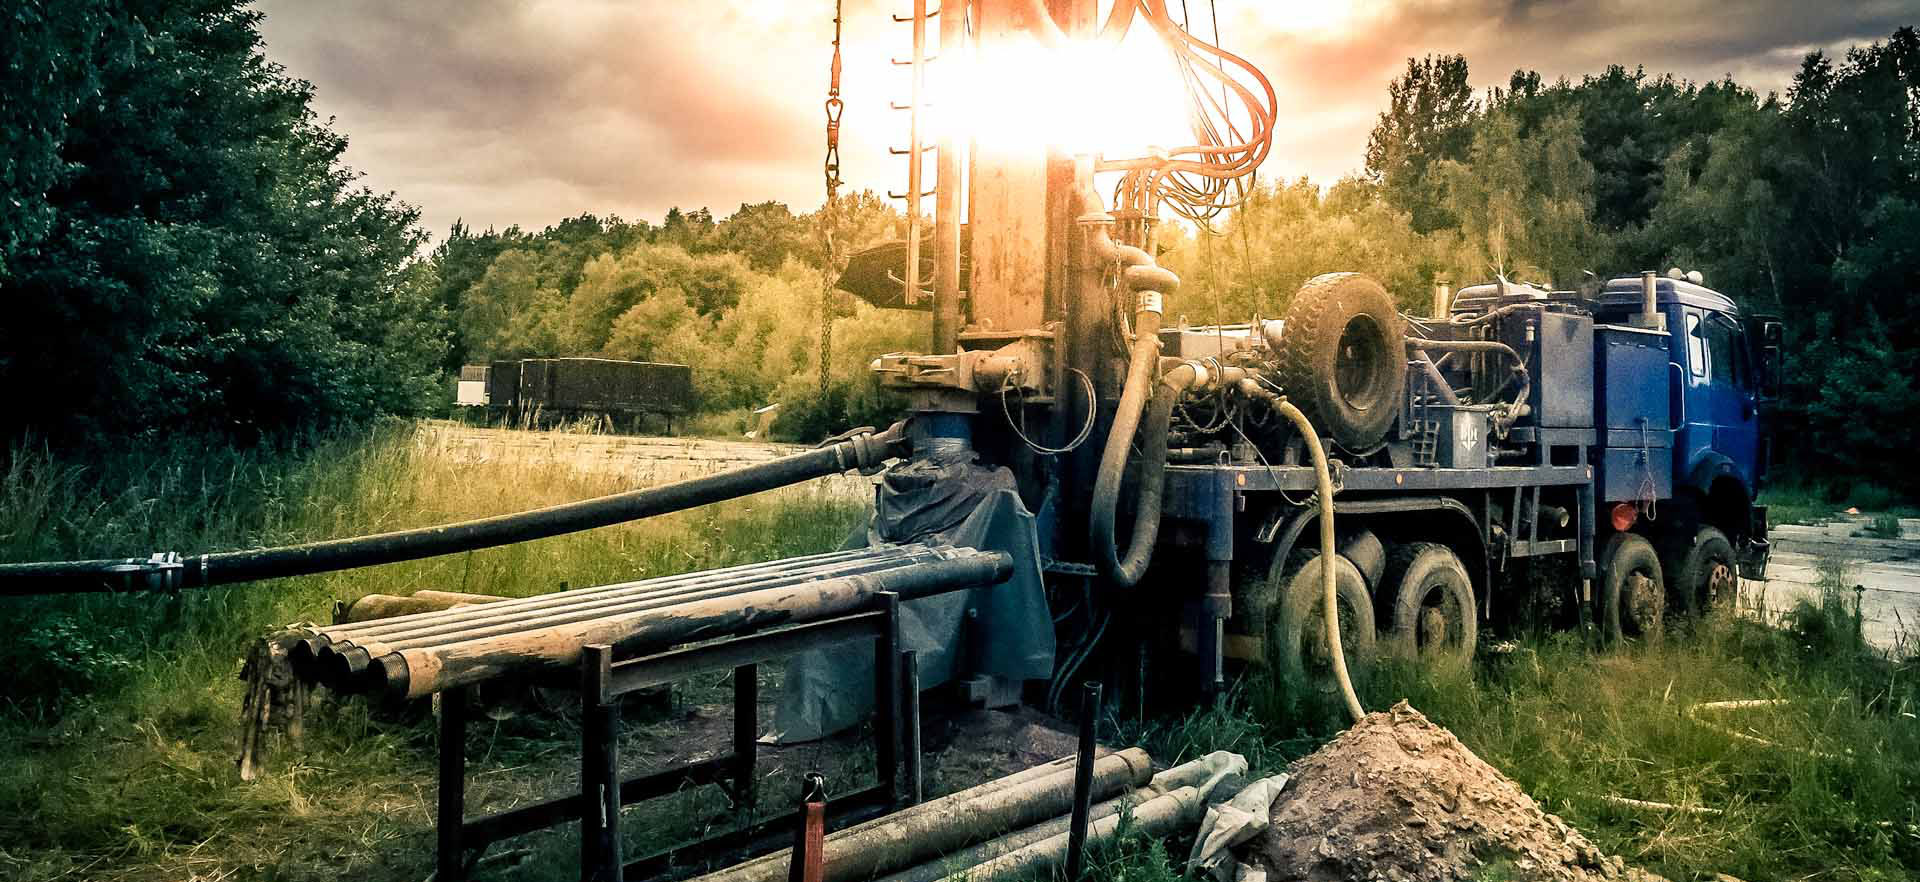 drilling_truck3